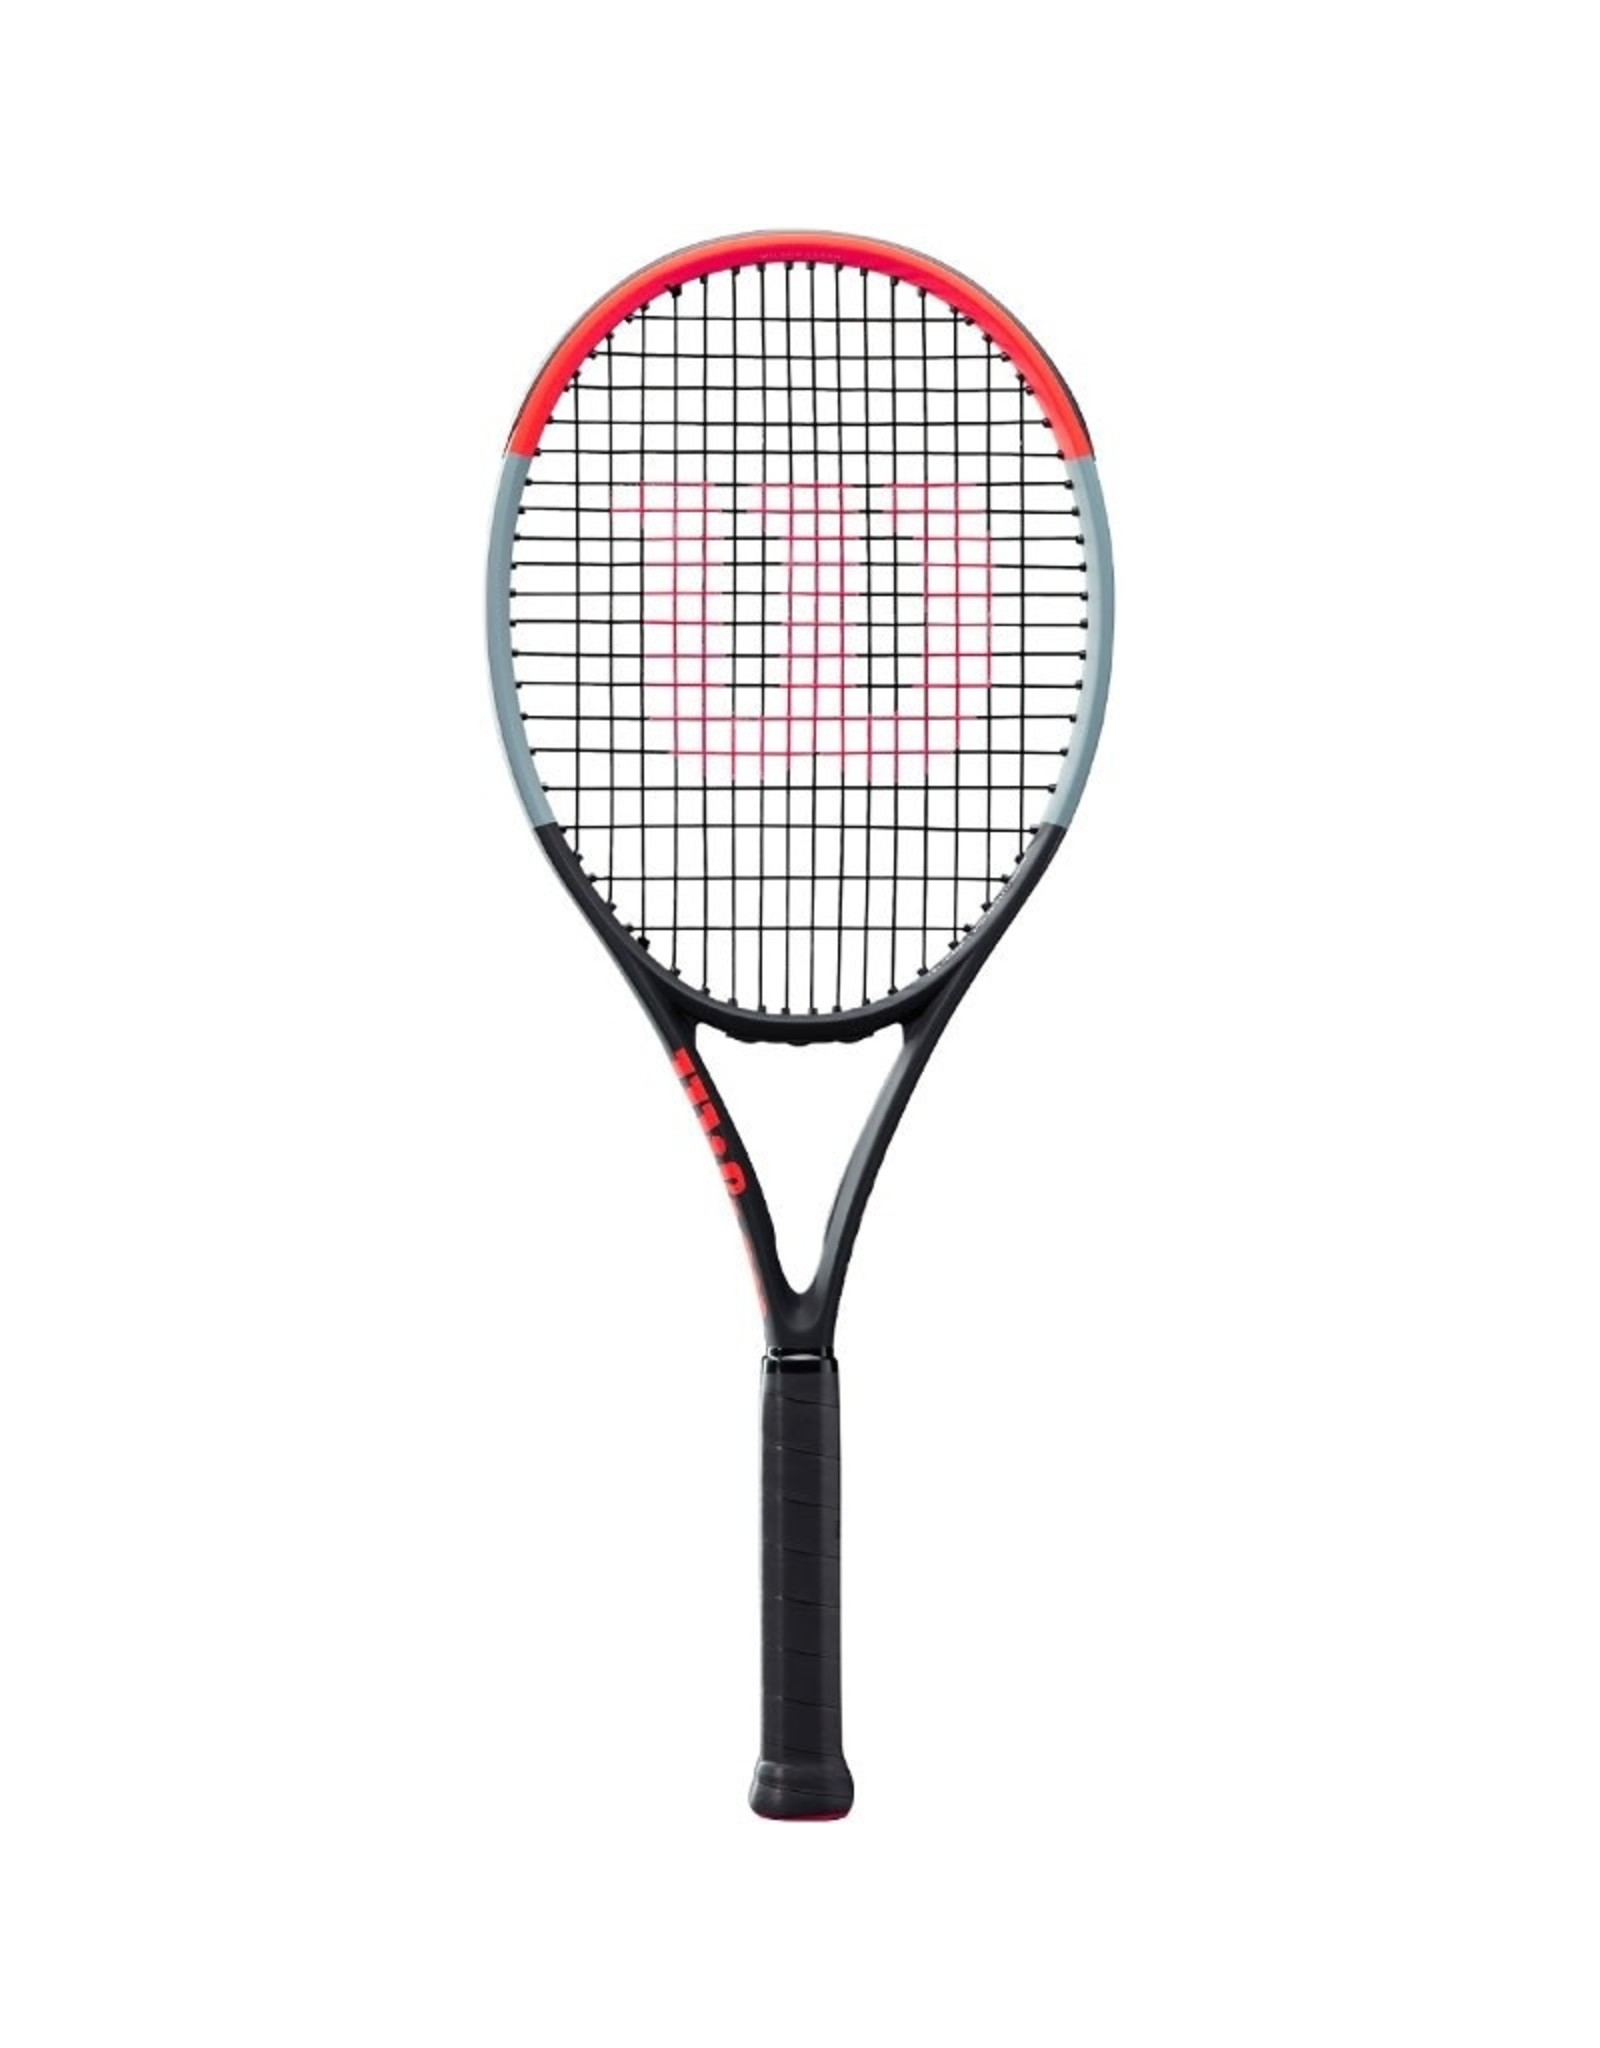 "Wilson Wilson Clash Jr 25 (3 7/8"") Tennis Racquet"